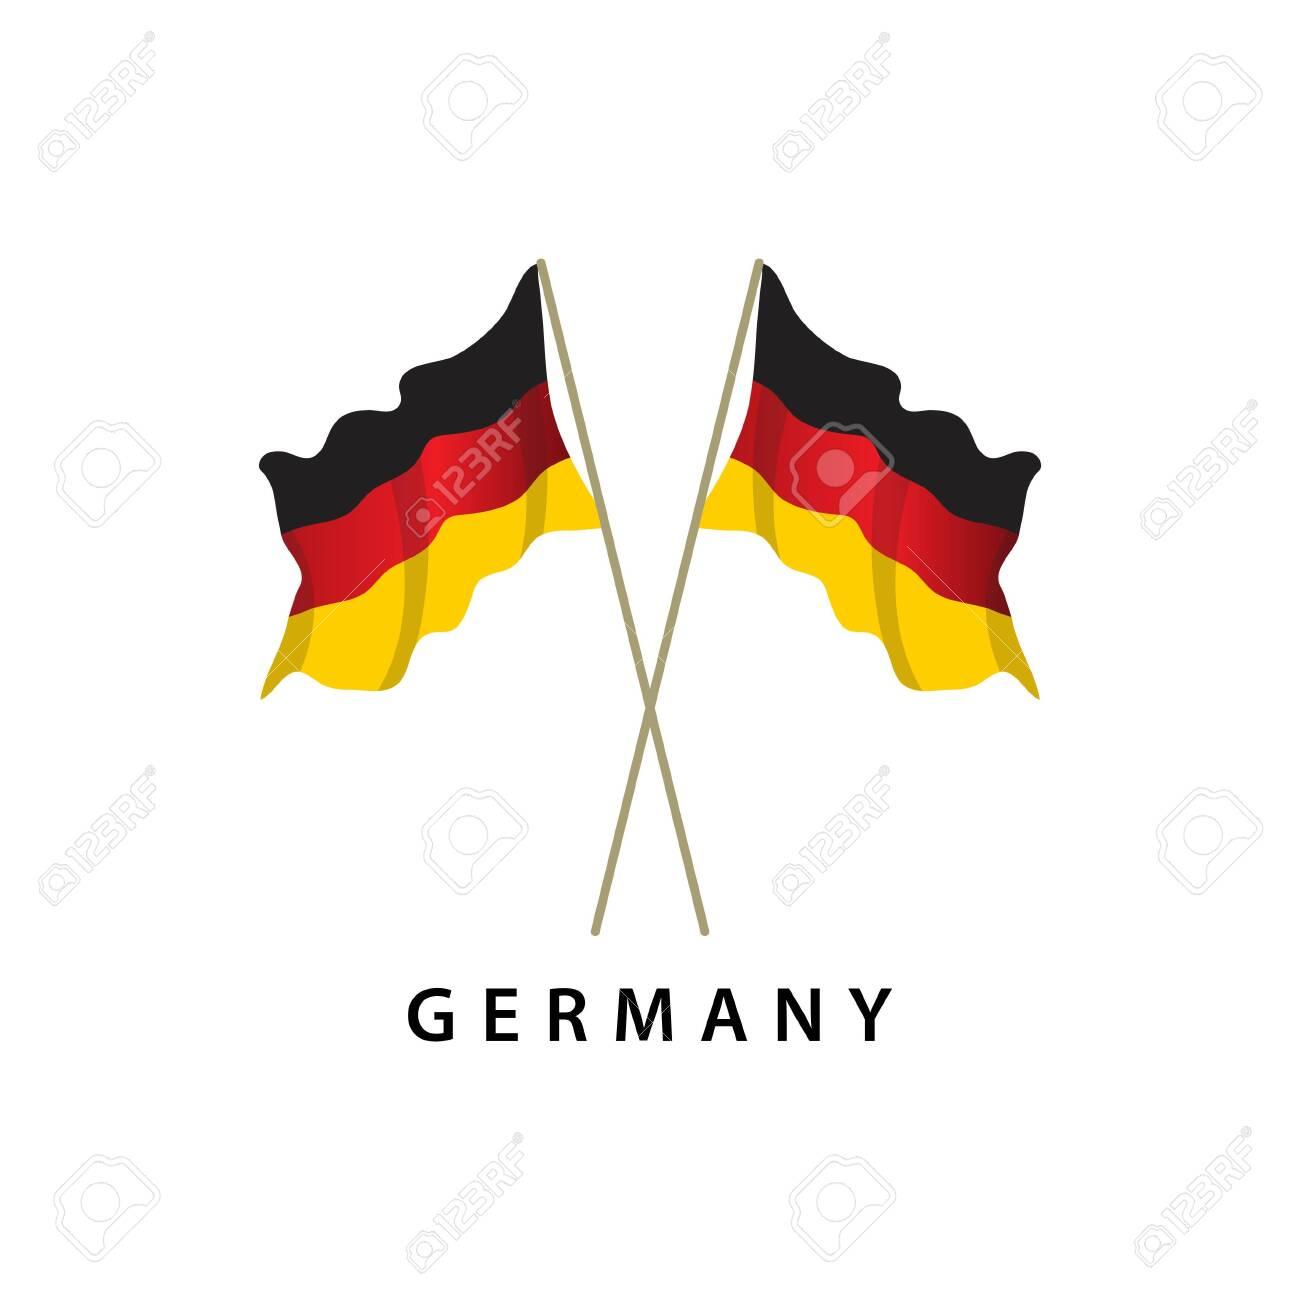 Germany Flag Vector Template Design Illustration - 122571392